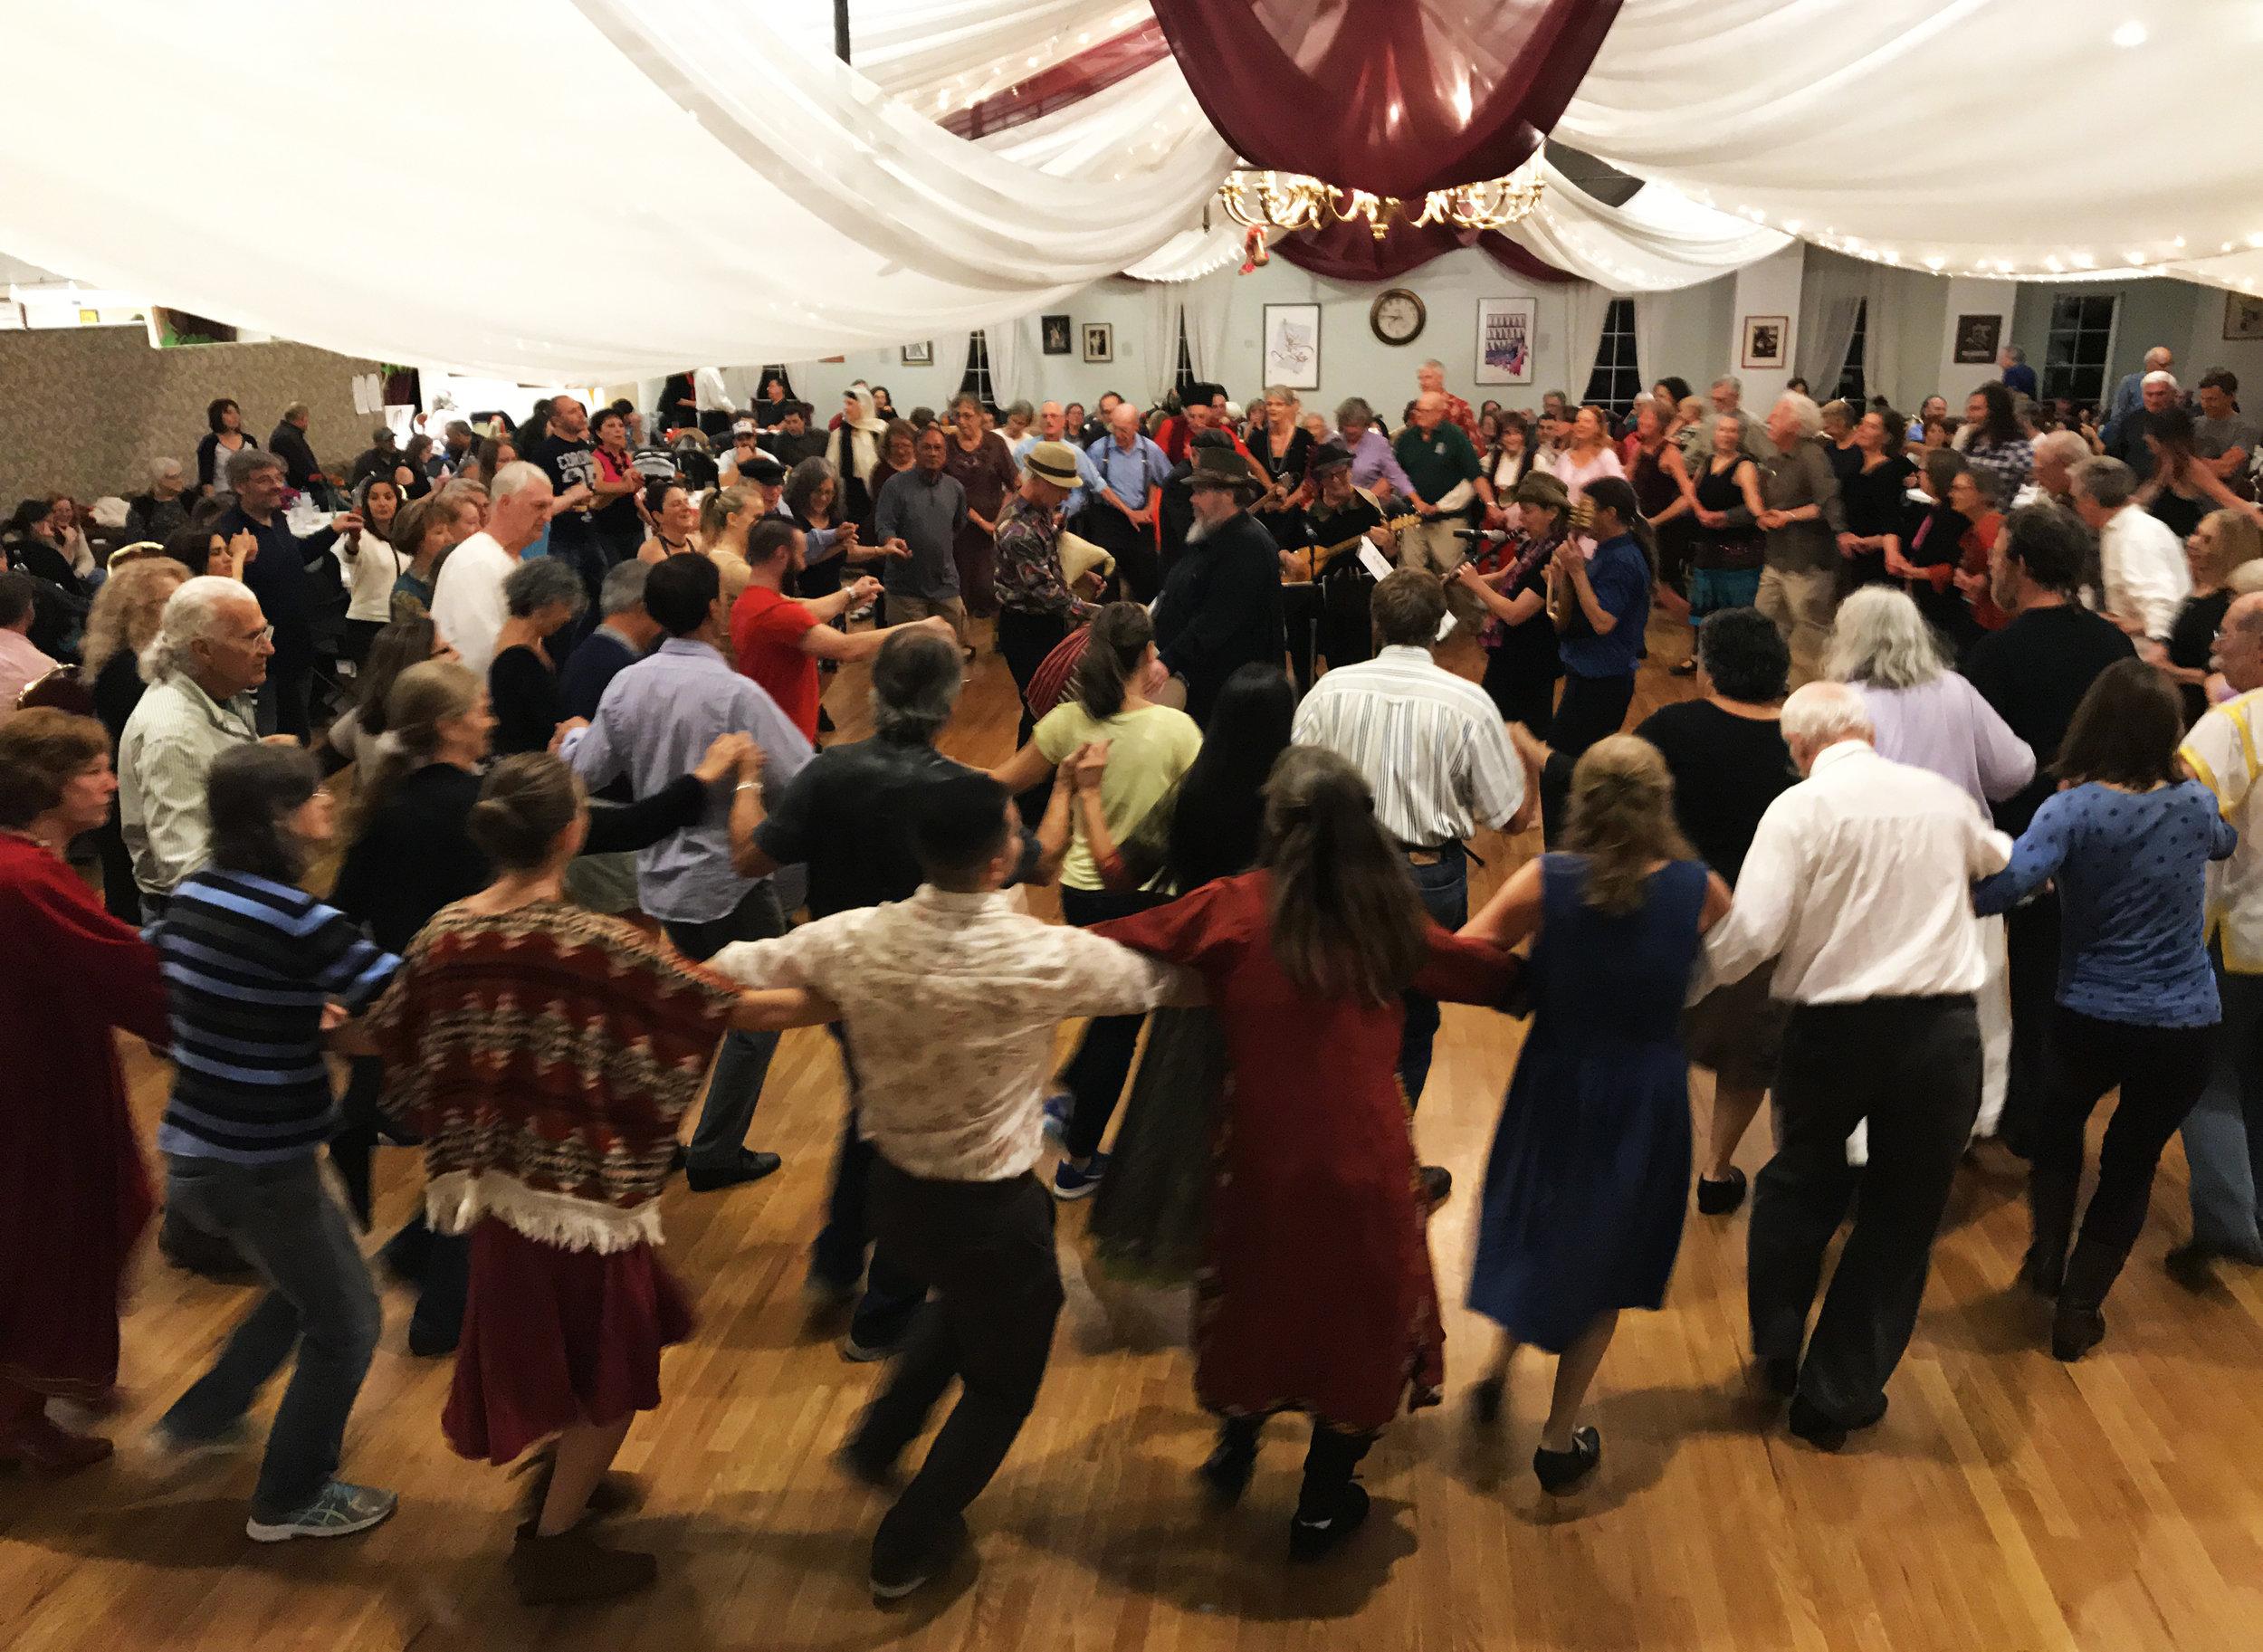 Boulder Balkan Bash 2016: the crowd dances to the Bitovniks